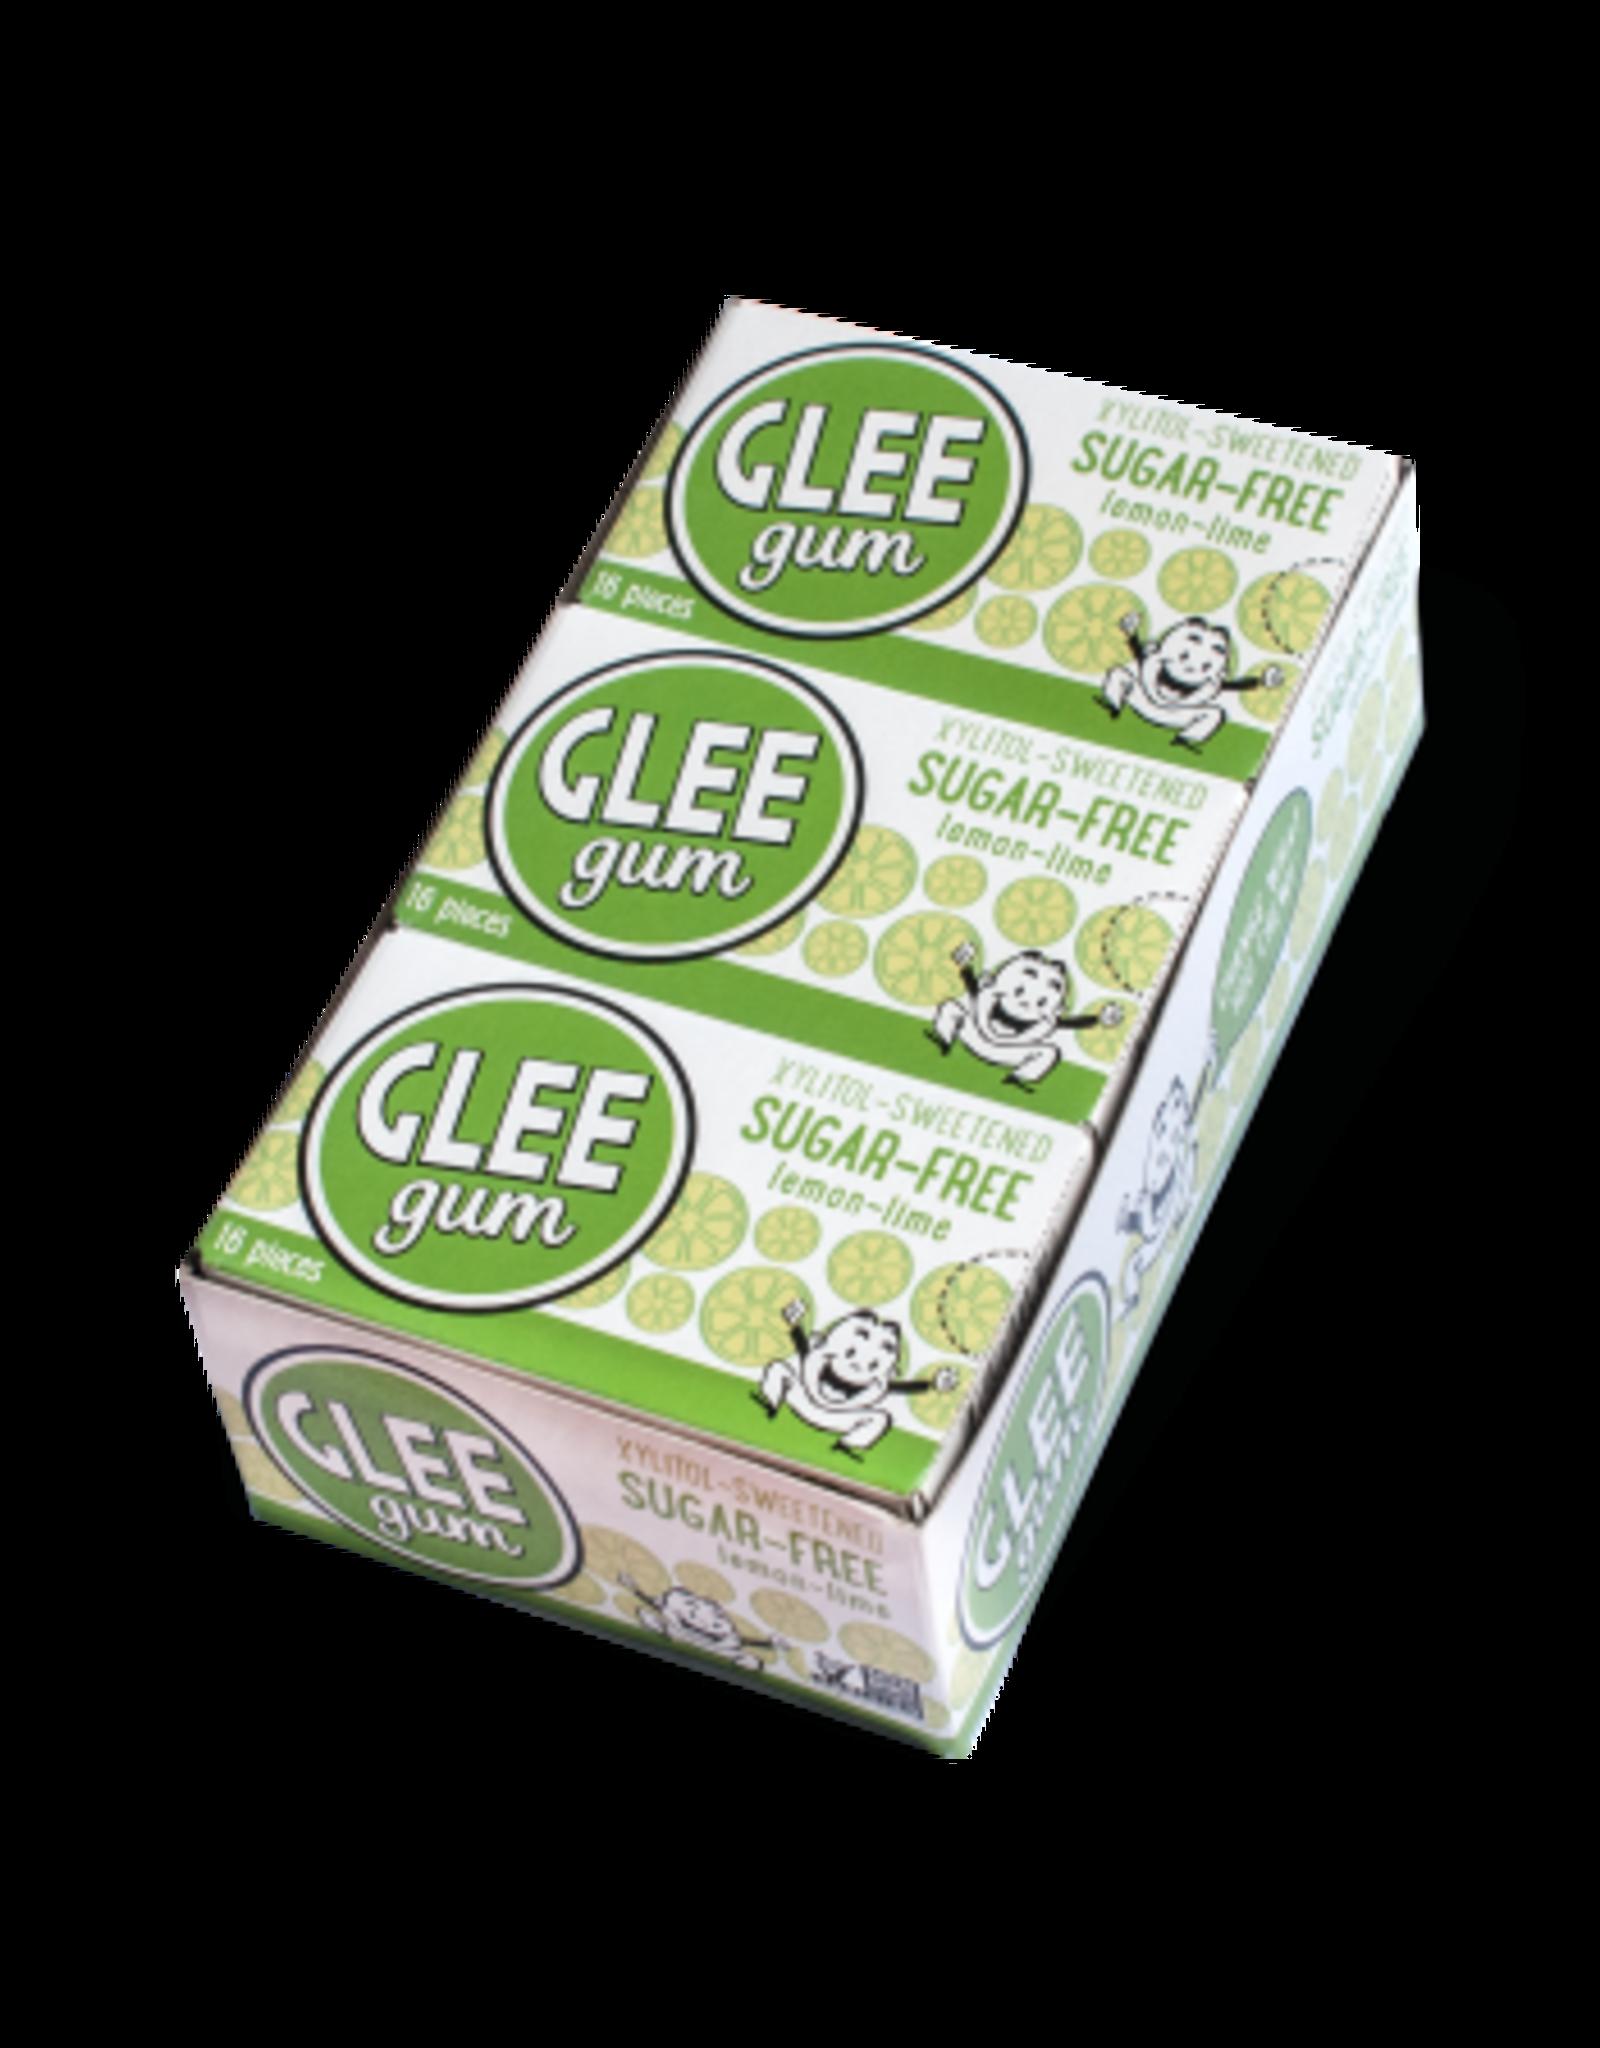 Glee Gum Lemon Lime Sugar-Free Gum - Xylitol Sweetened - 16pcs